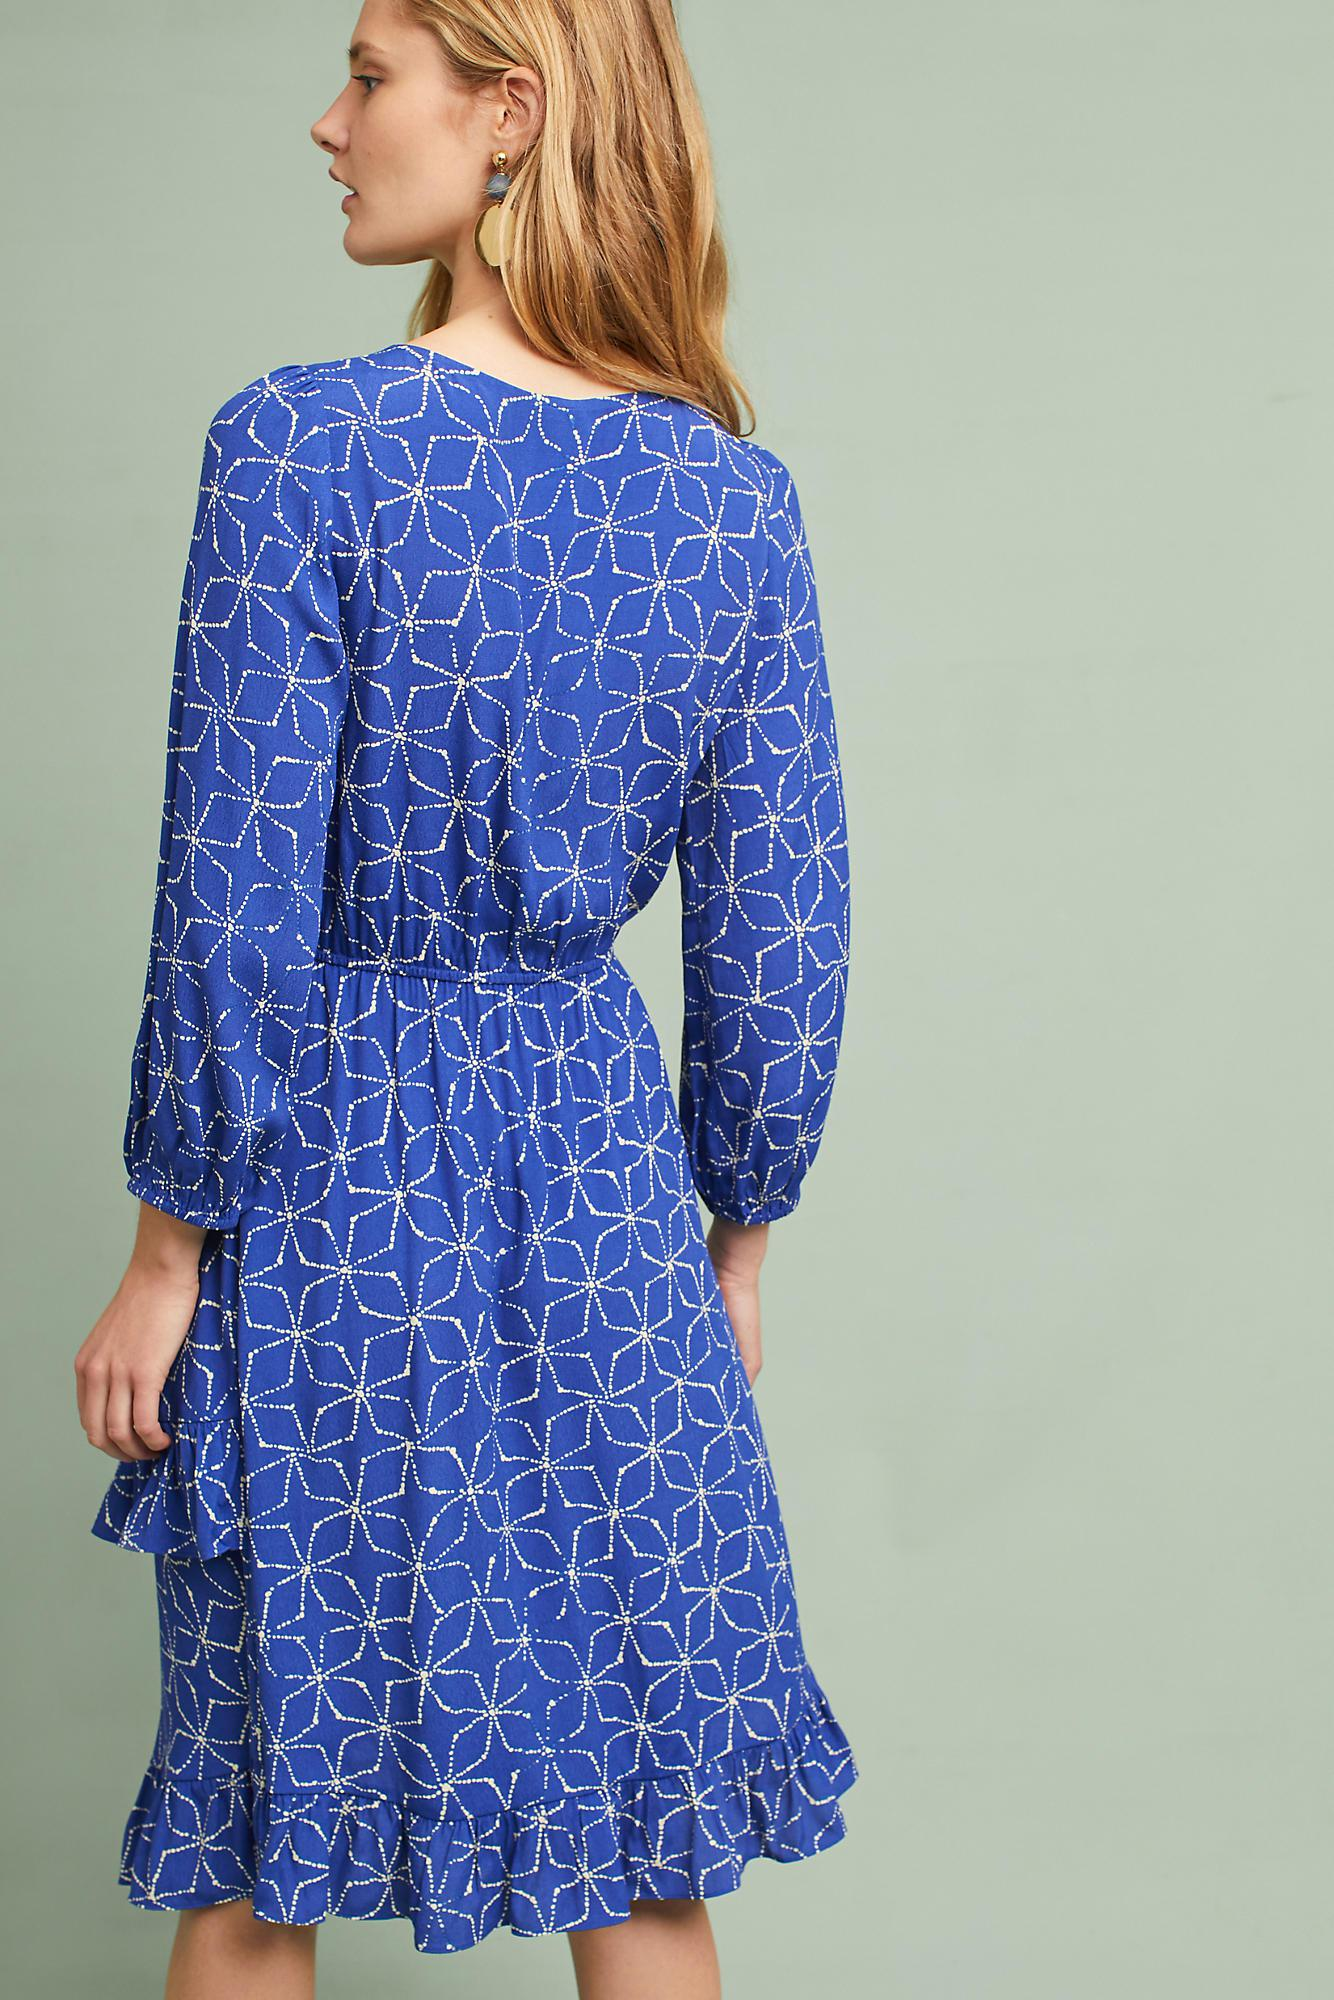 b13548286b43 Anthropologie Aleah Dress in Blue - Lyst